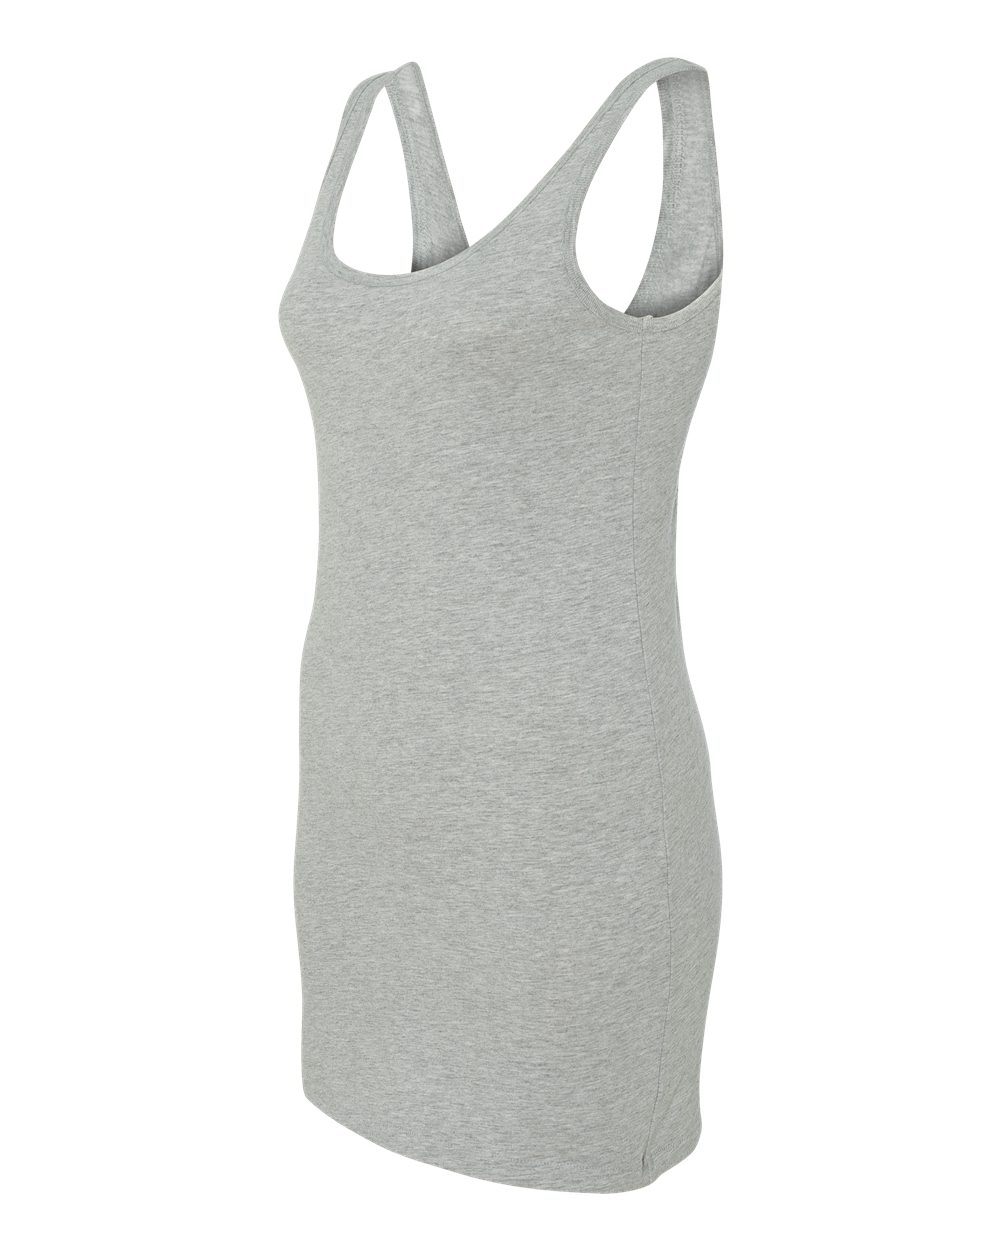 Bella 6012 - Ladies' Jersey Tank Dress